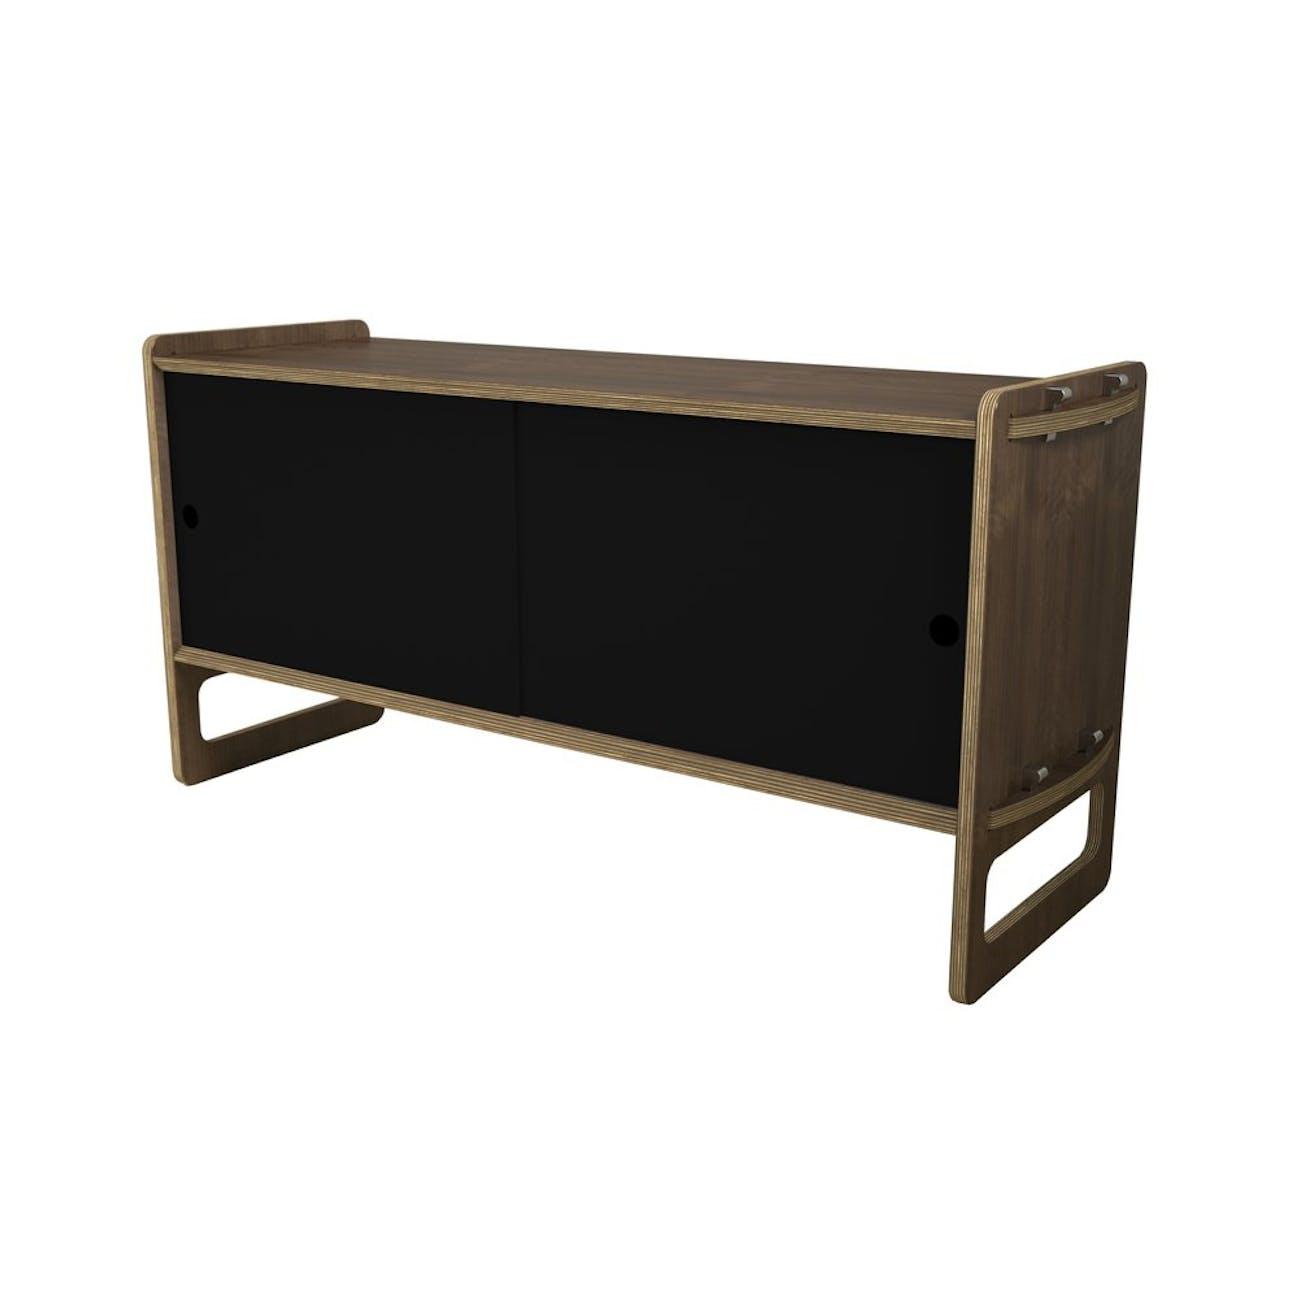 A black storage cabinet.